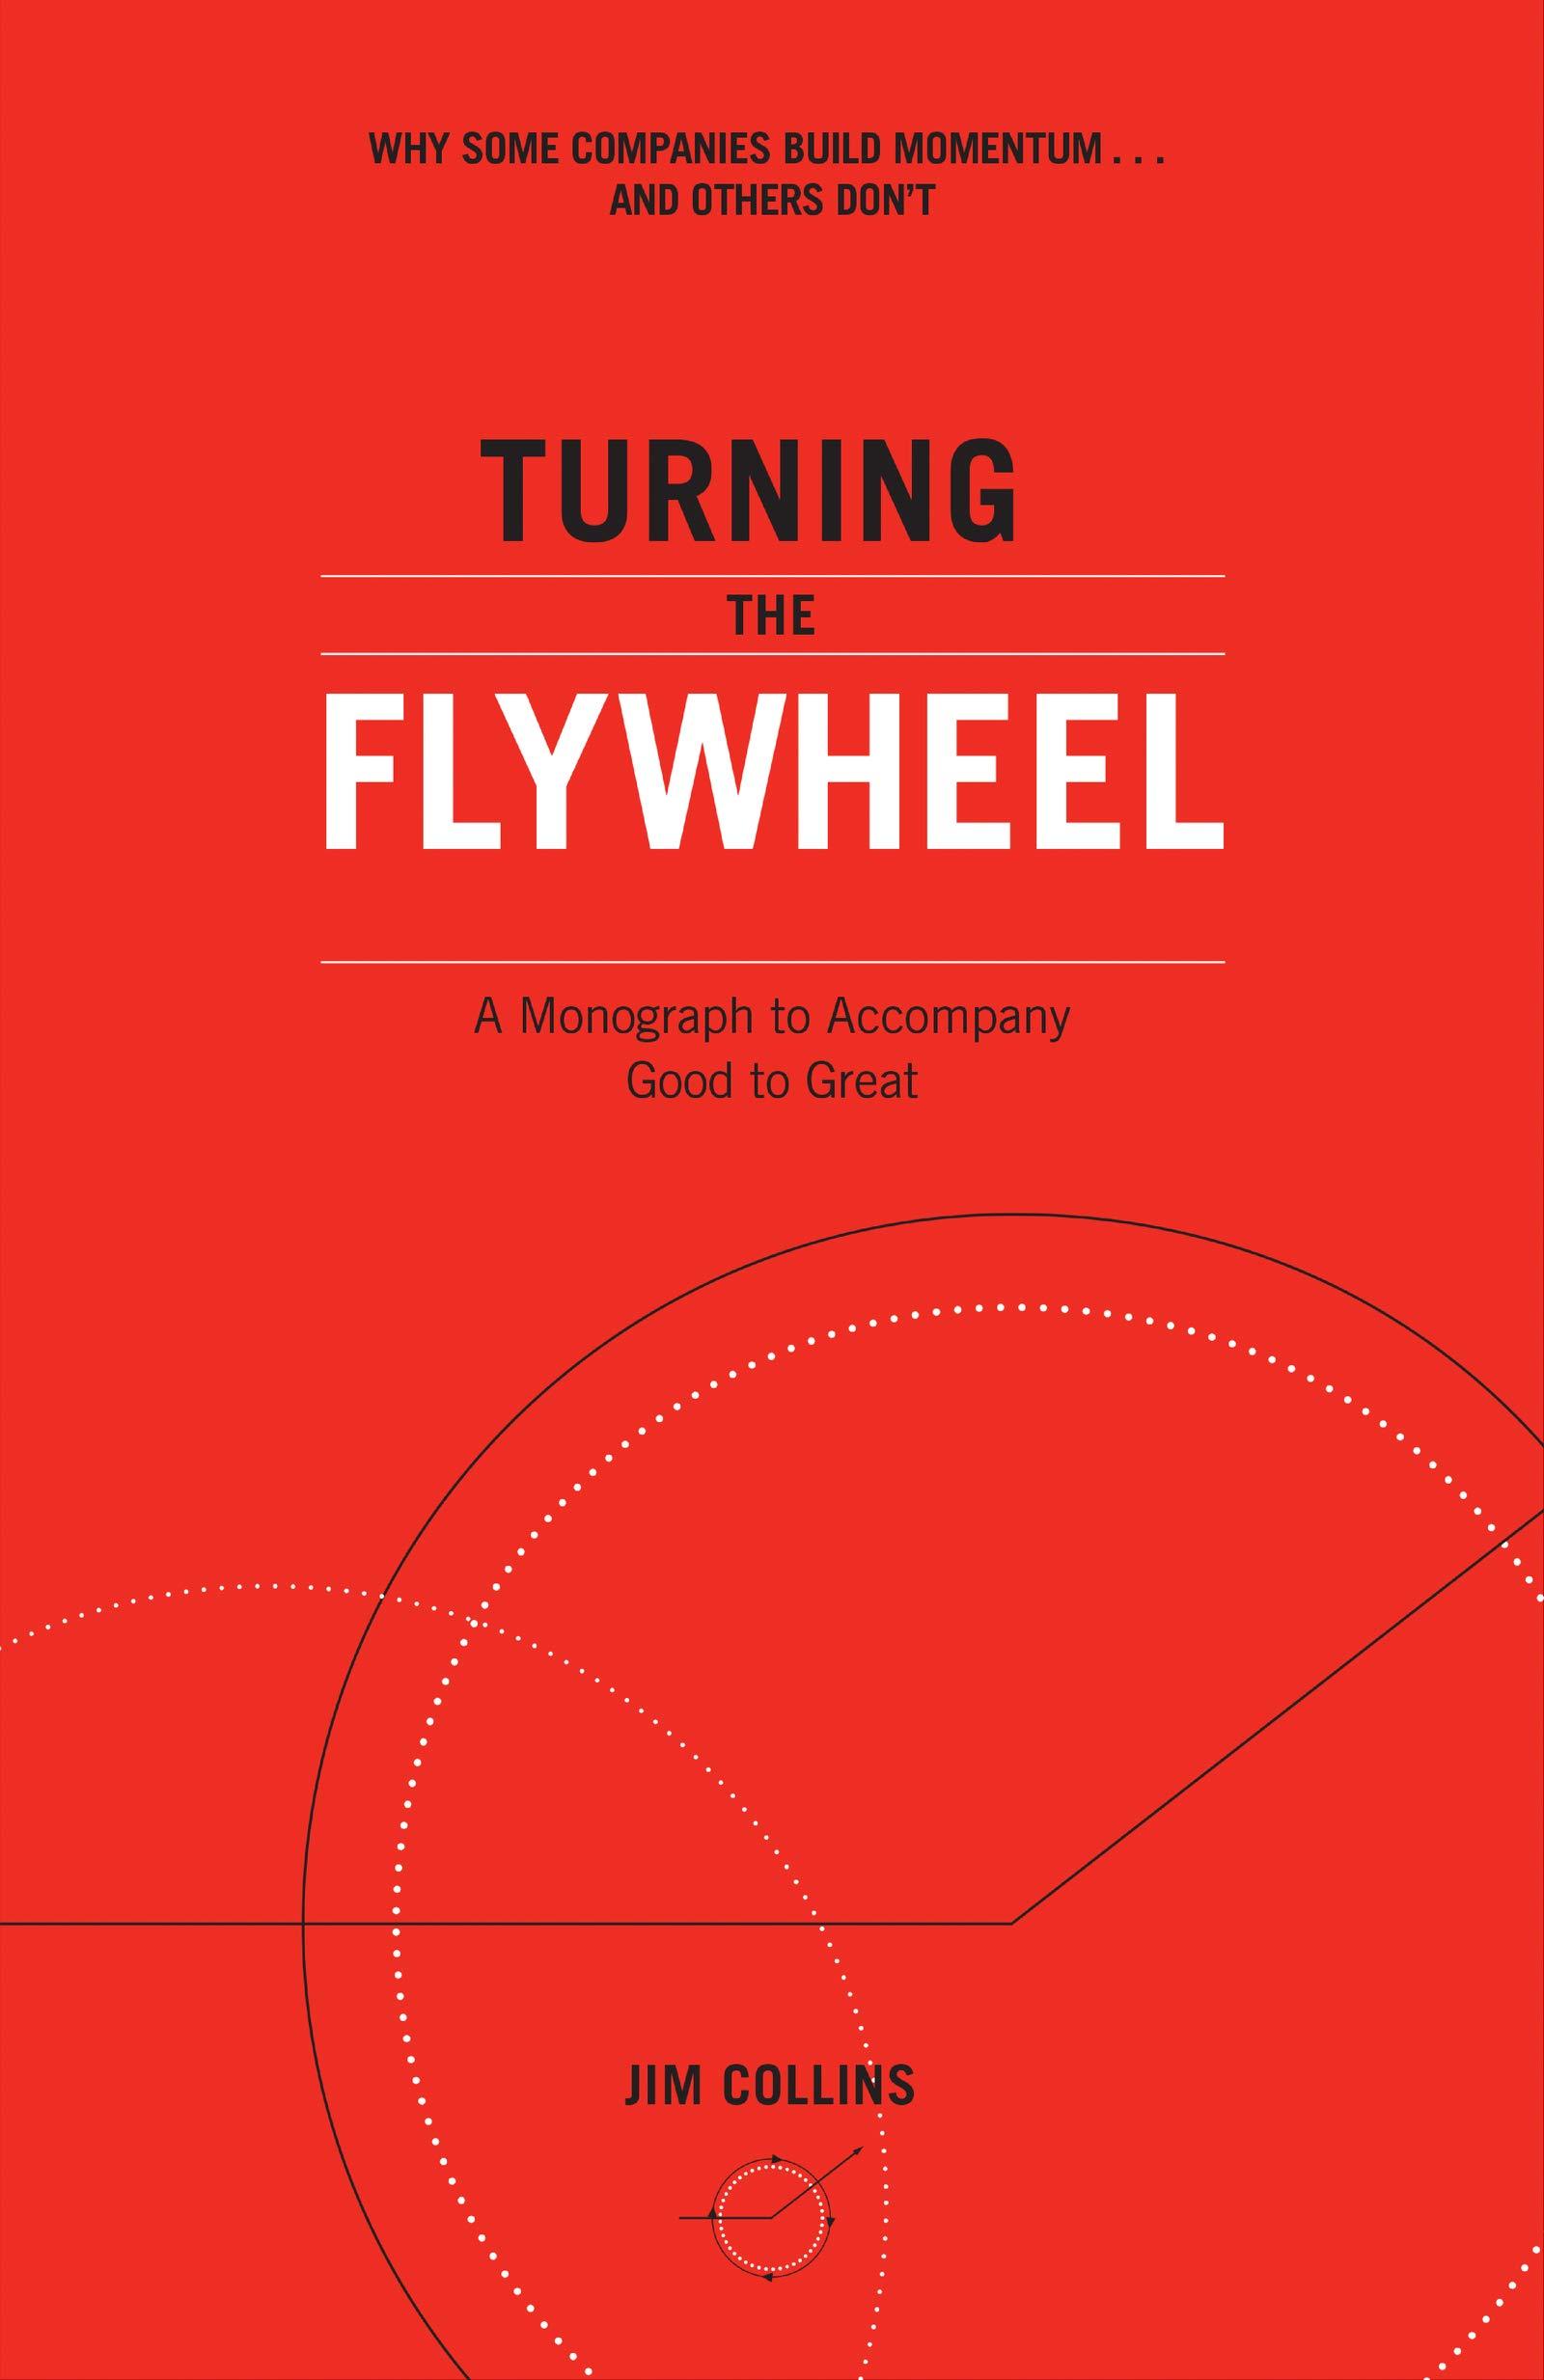 Jim Collins, Turning The Flywheel